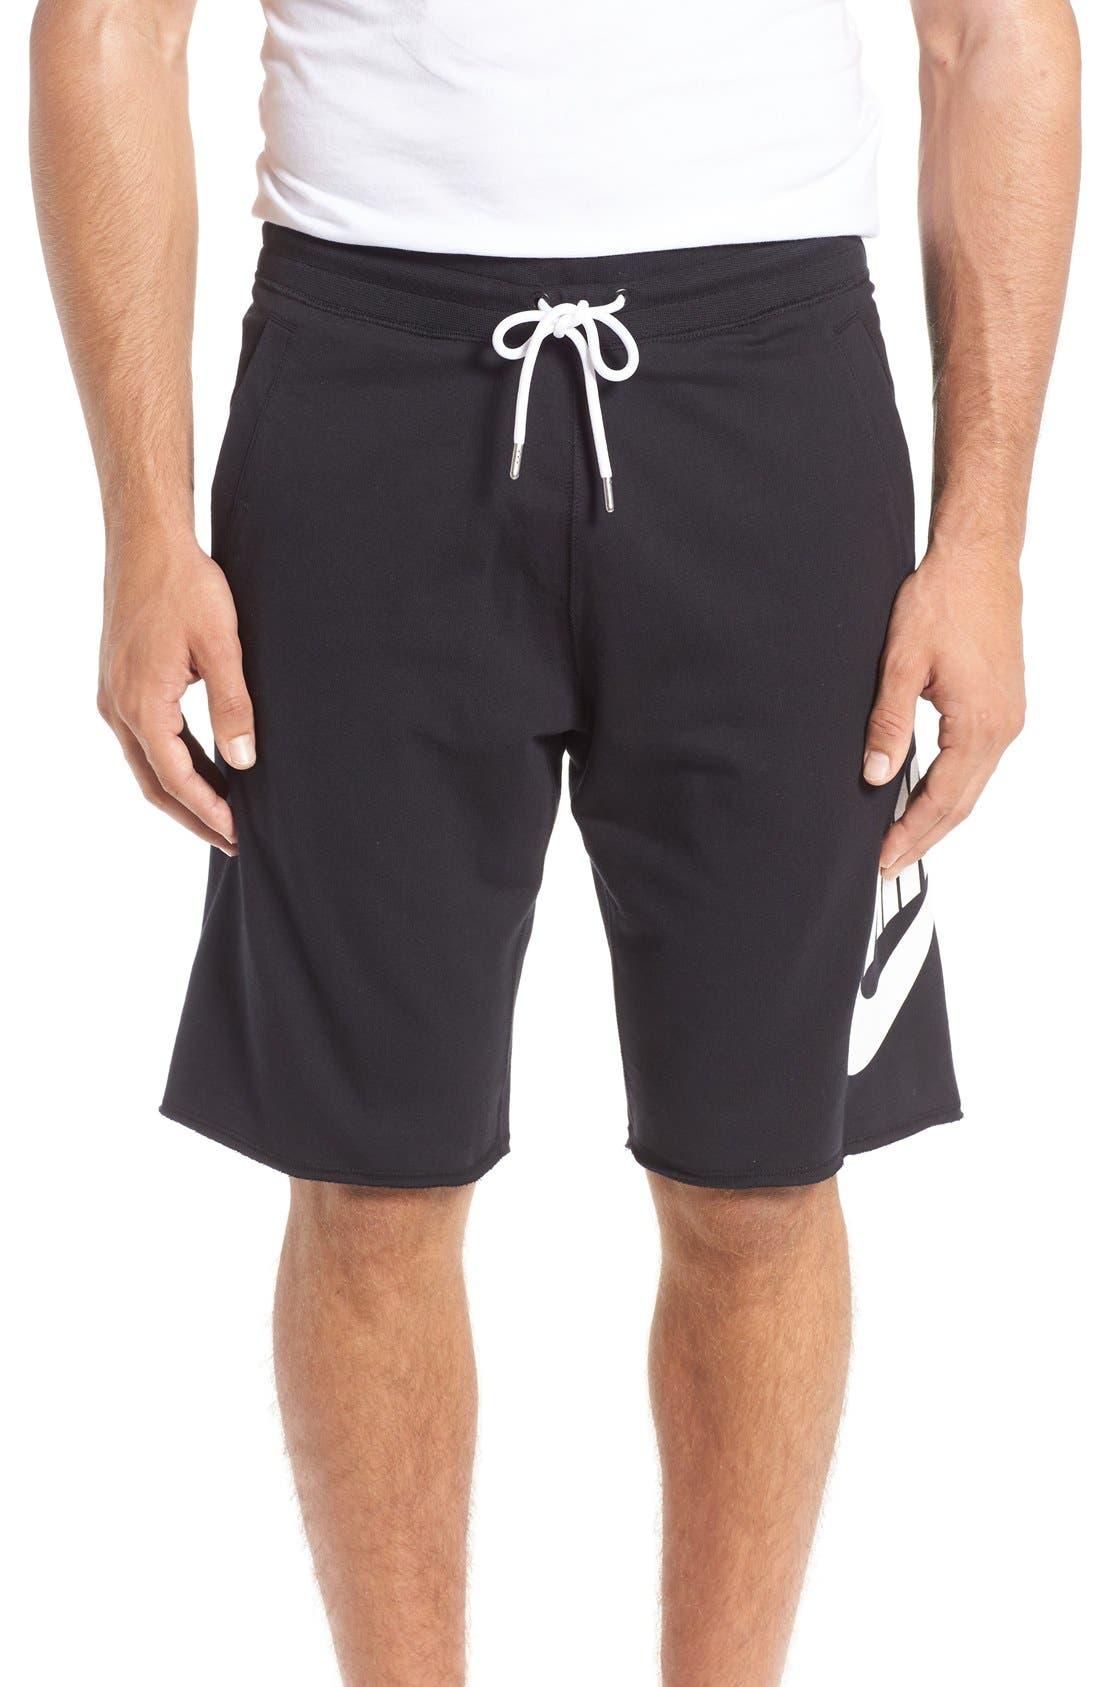 'NSW' Logo French Terry Shorts,                             Main thumbnail 1, color,                             BLACK/ WHITE